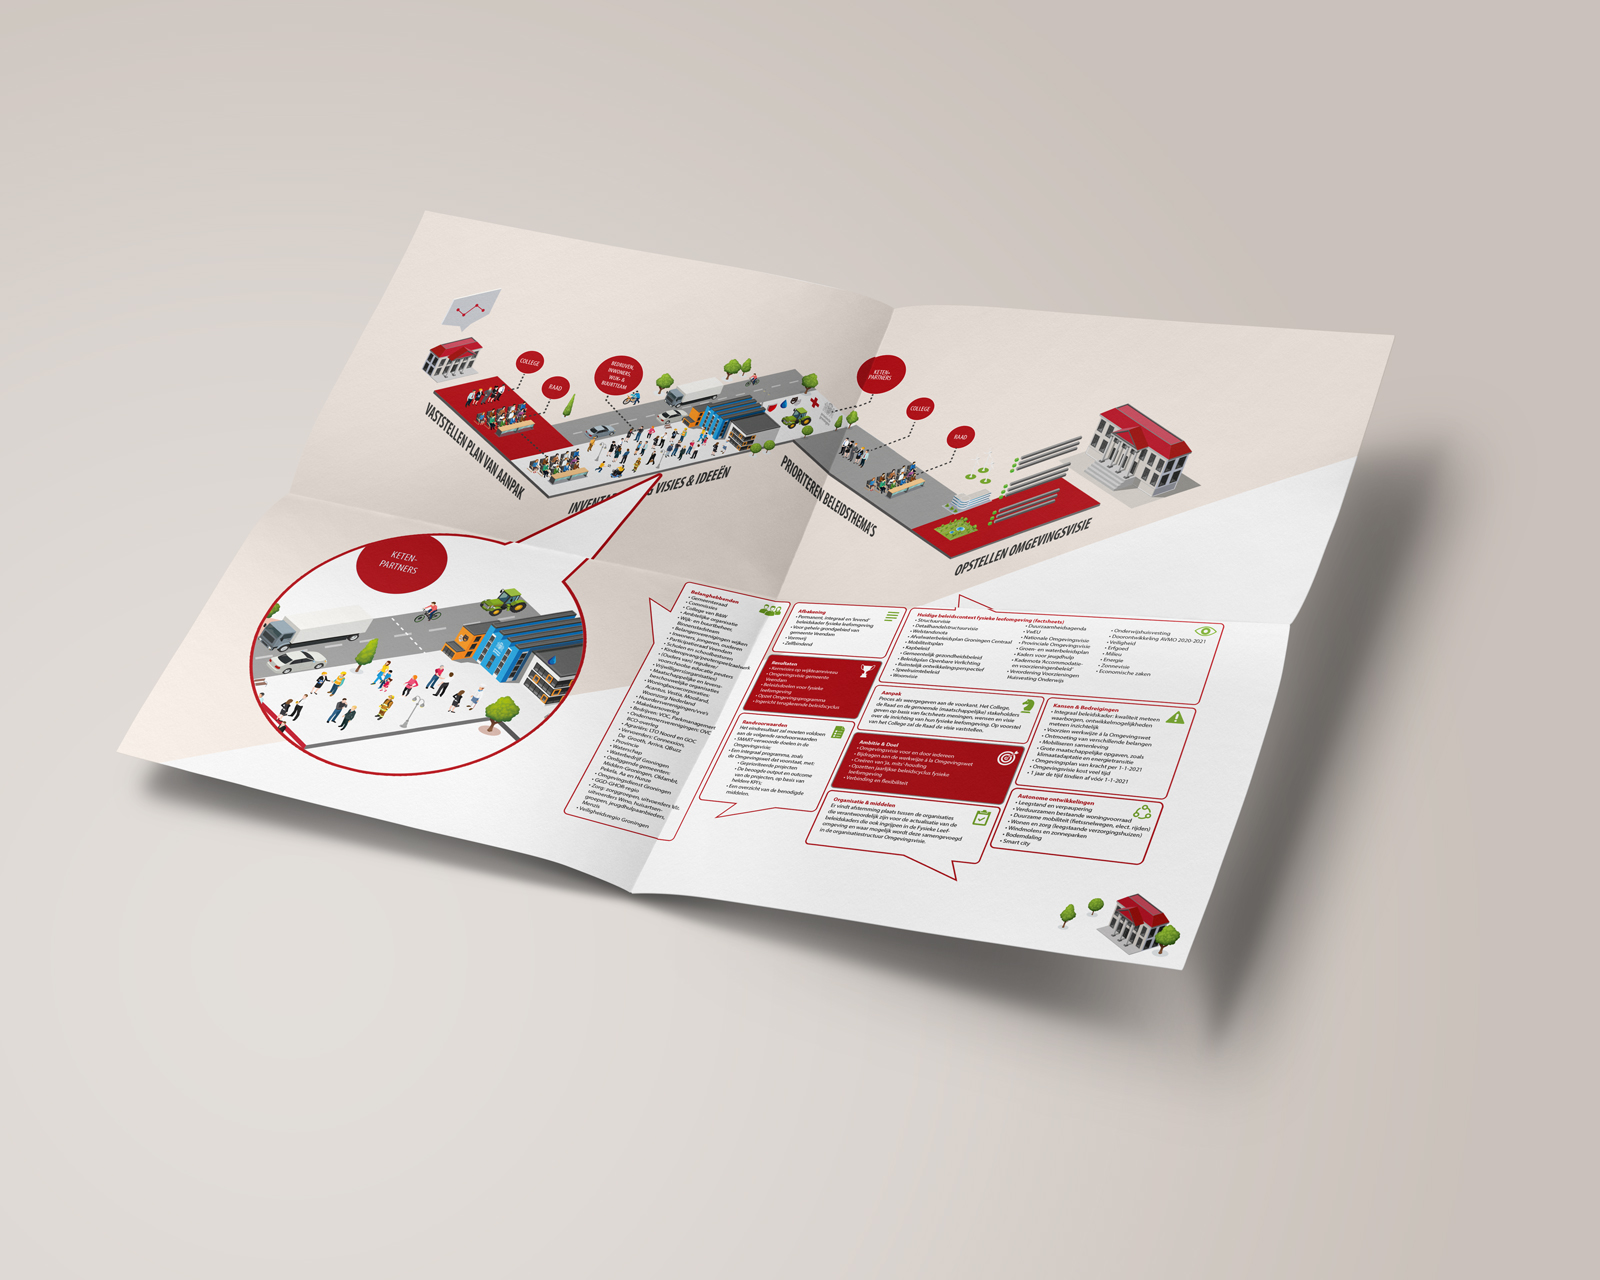 Beeldmarq | NCOD Gemeente Veendam | Infographic